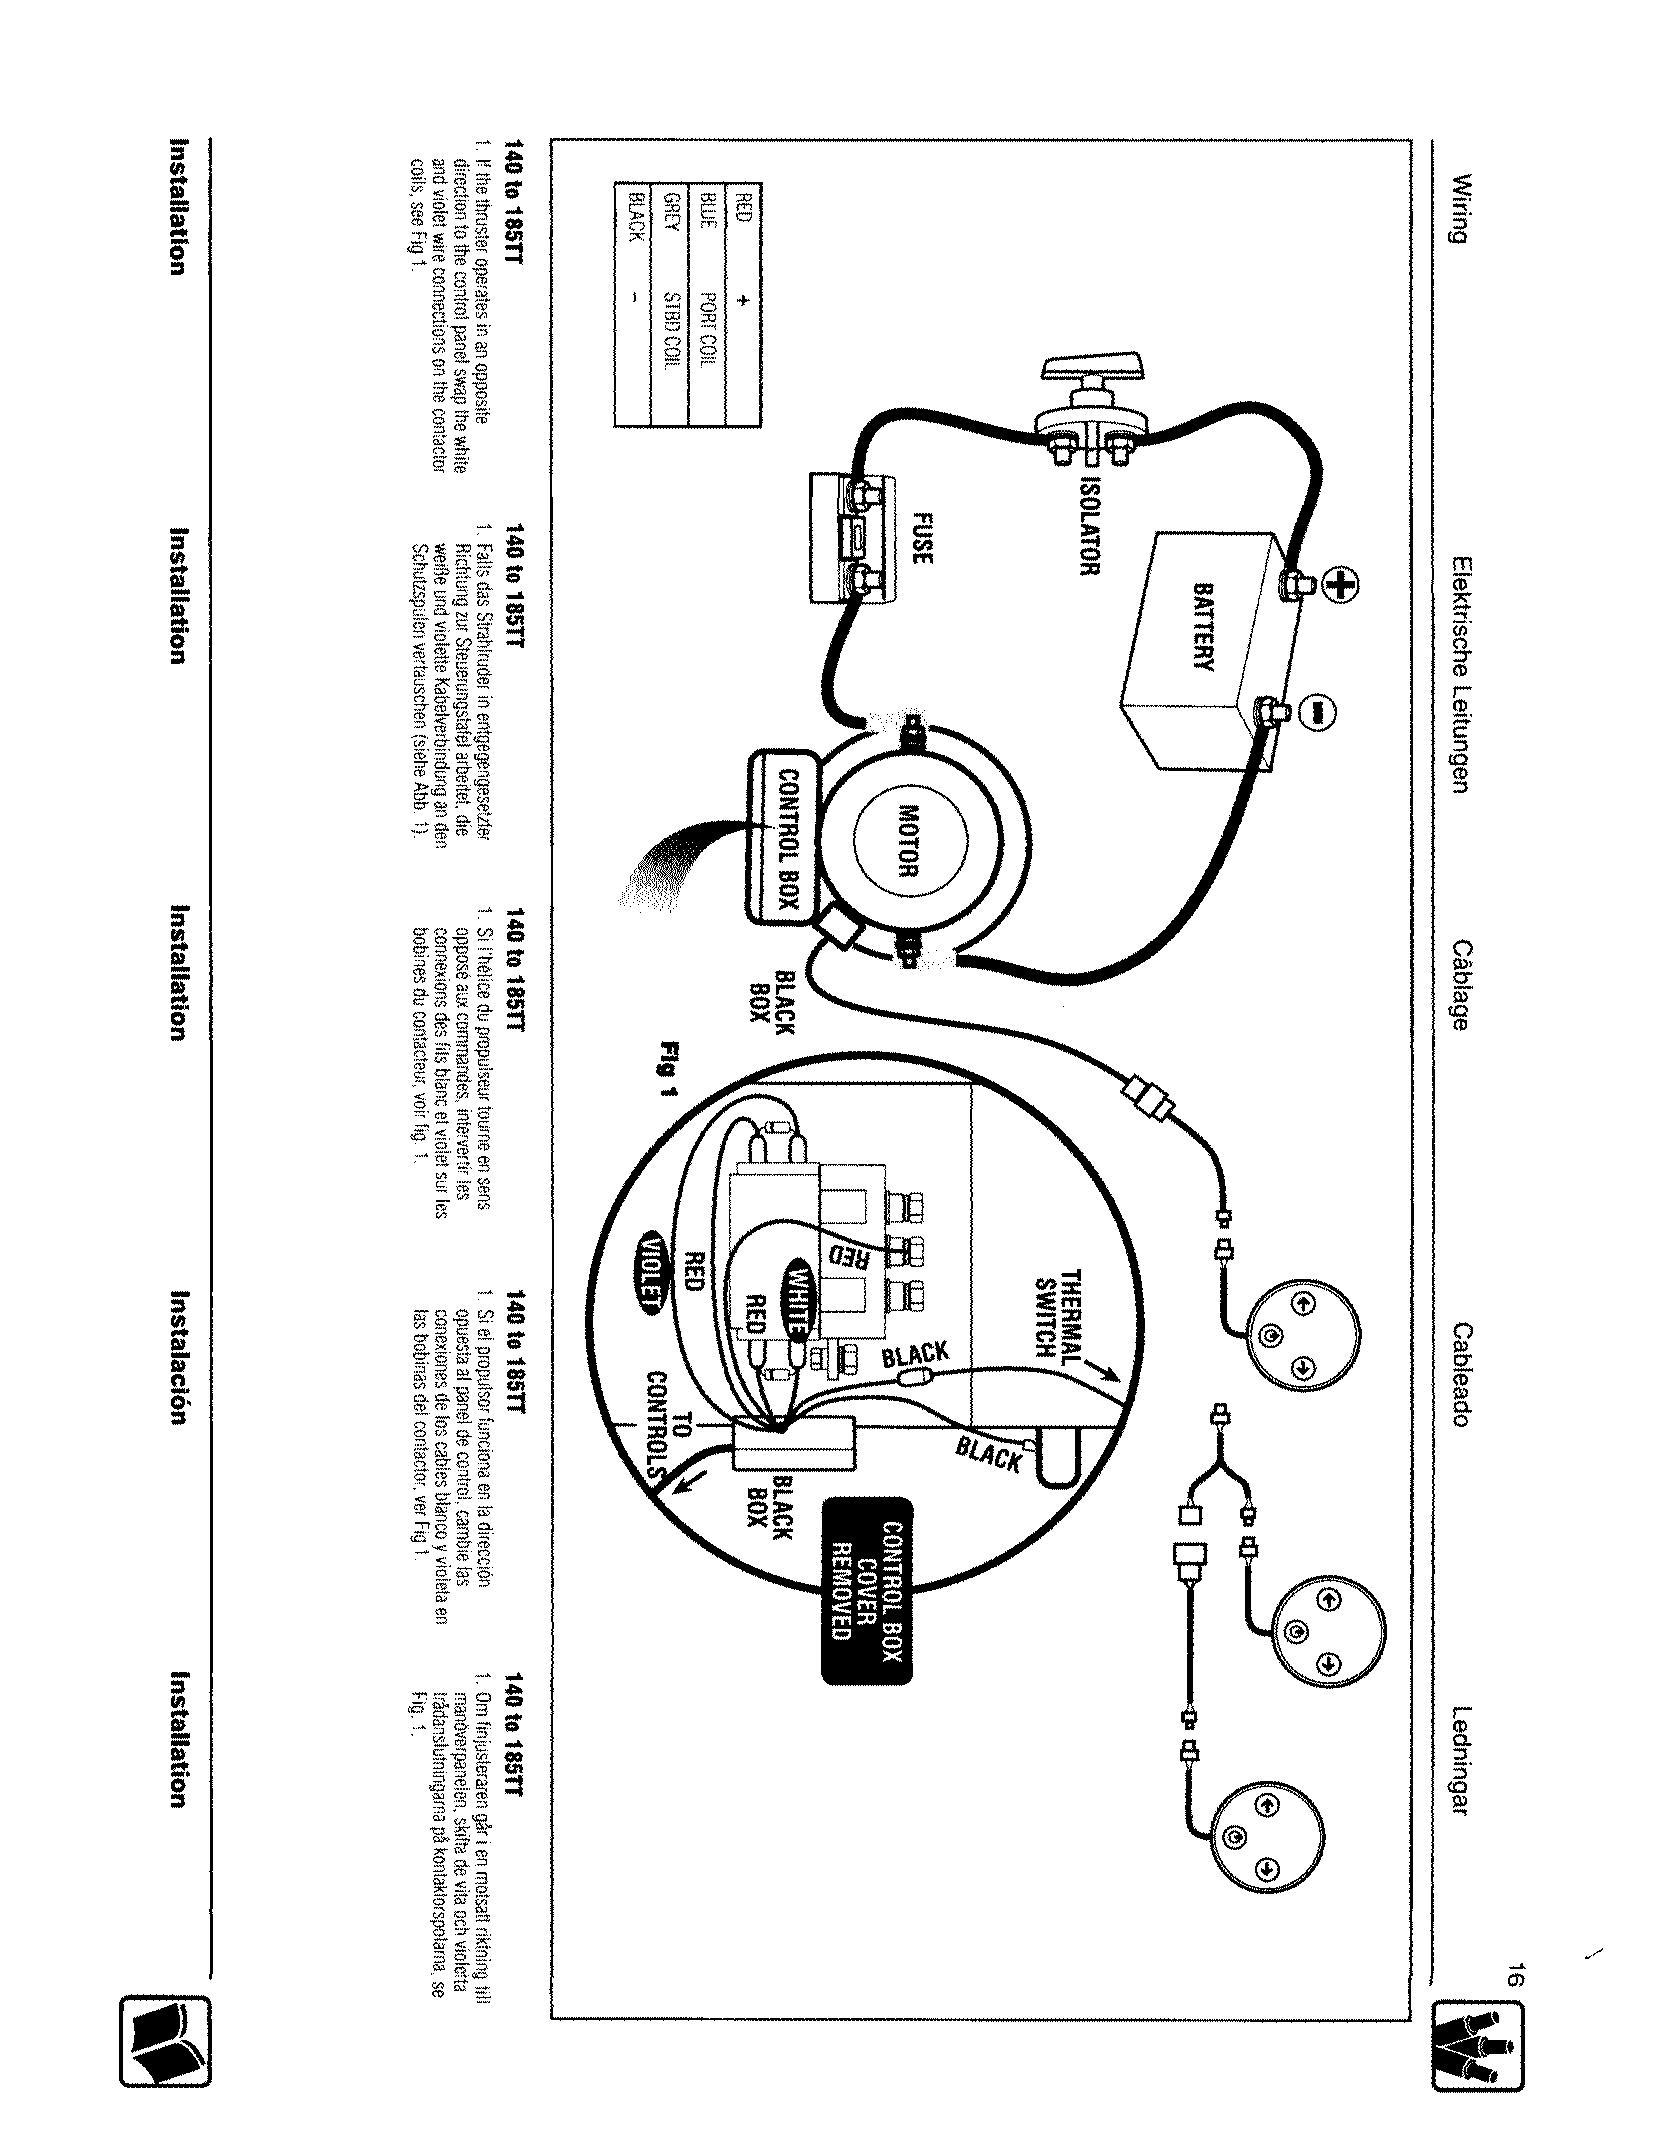 Lewmar Wiring Diagram | Wiring Diagram on electronic circuit diagrams, transformer diagrams, lighting diagrams, battery diagrams, engine diagrams, sincgars radio configurations diagrams, gmc fuse box diagrams, friendship bracelet diagrams, switch diagrams, hvac diagrams, troubleshooting diagrams, series and parallel circuits diagrams, electrical diagrams, snatch block diagrams, smart car diagrams, led circuit diagrams, pinout diagrams, honda motorcycle repair diagrams, internet of things diagrams, motor diagrams,